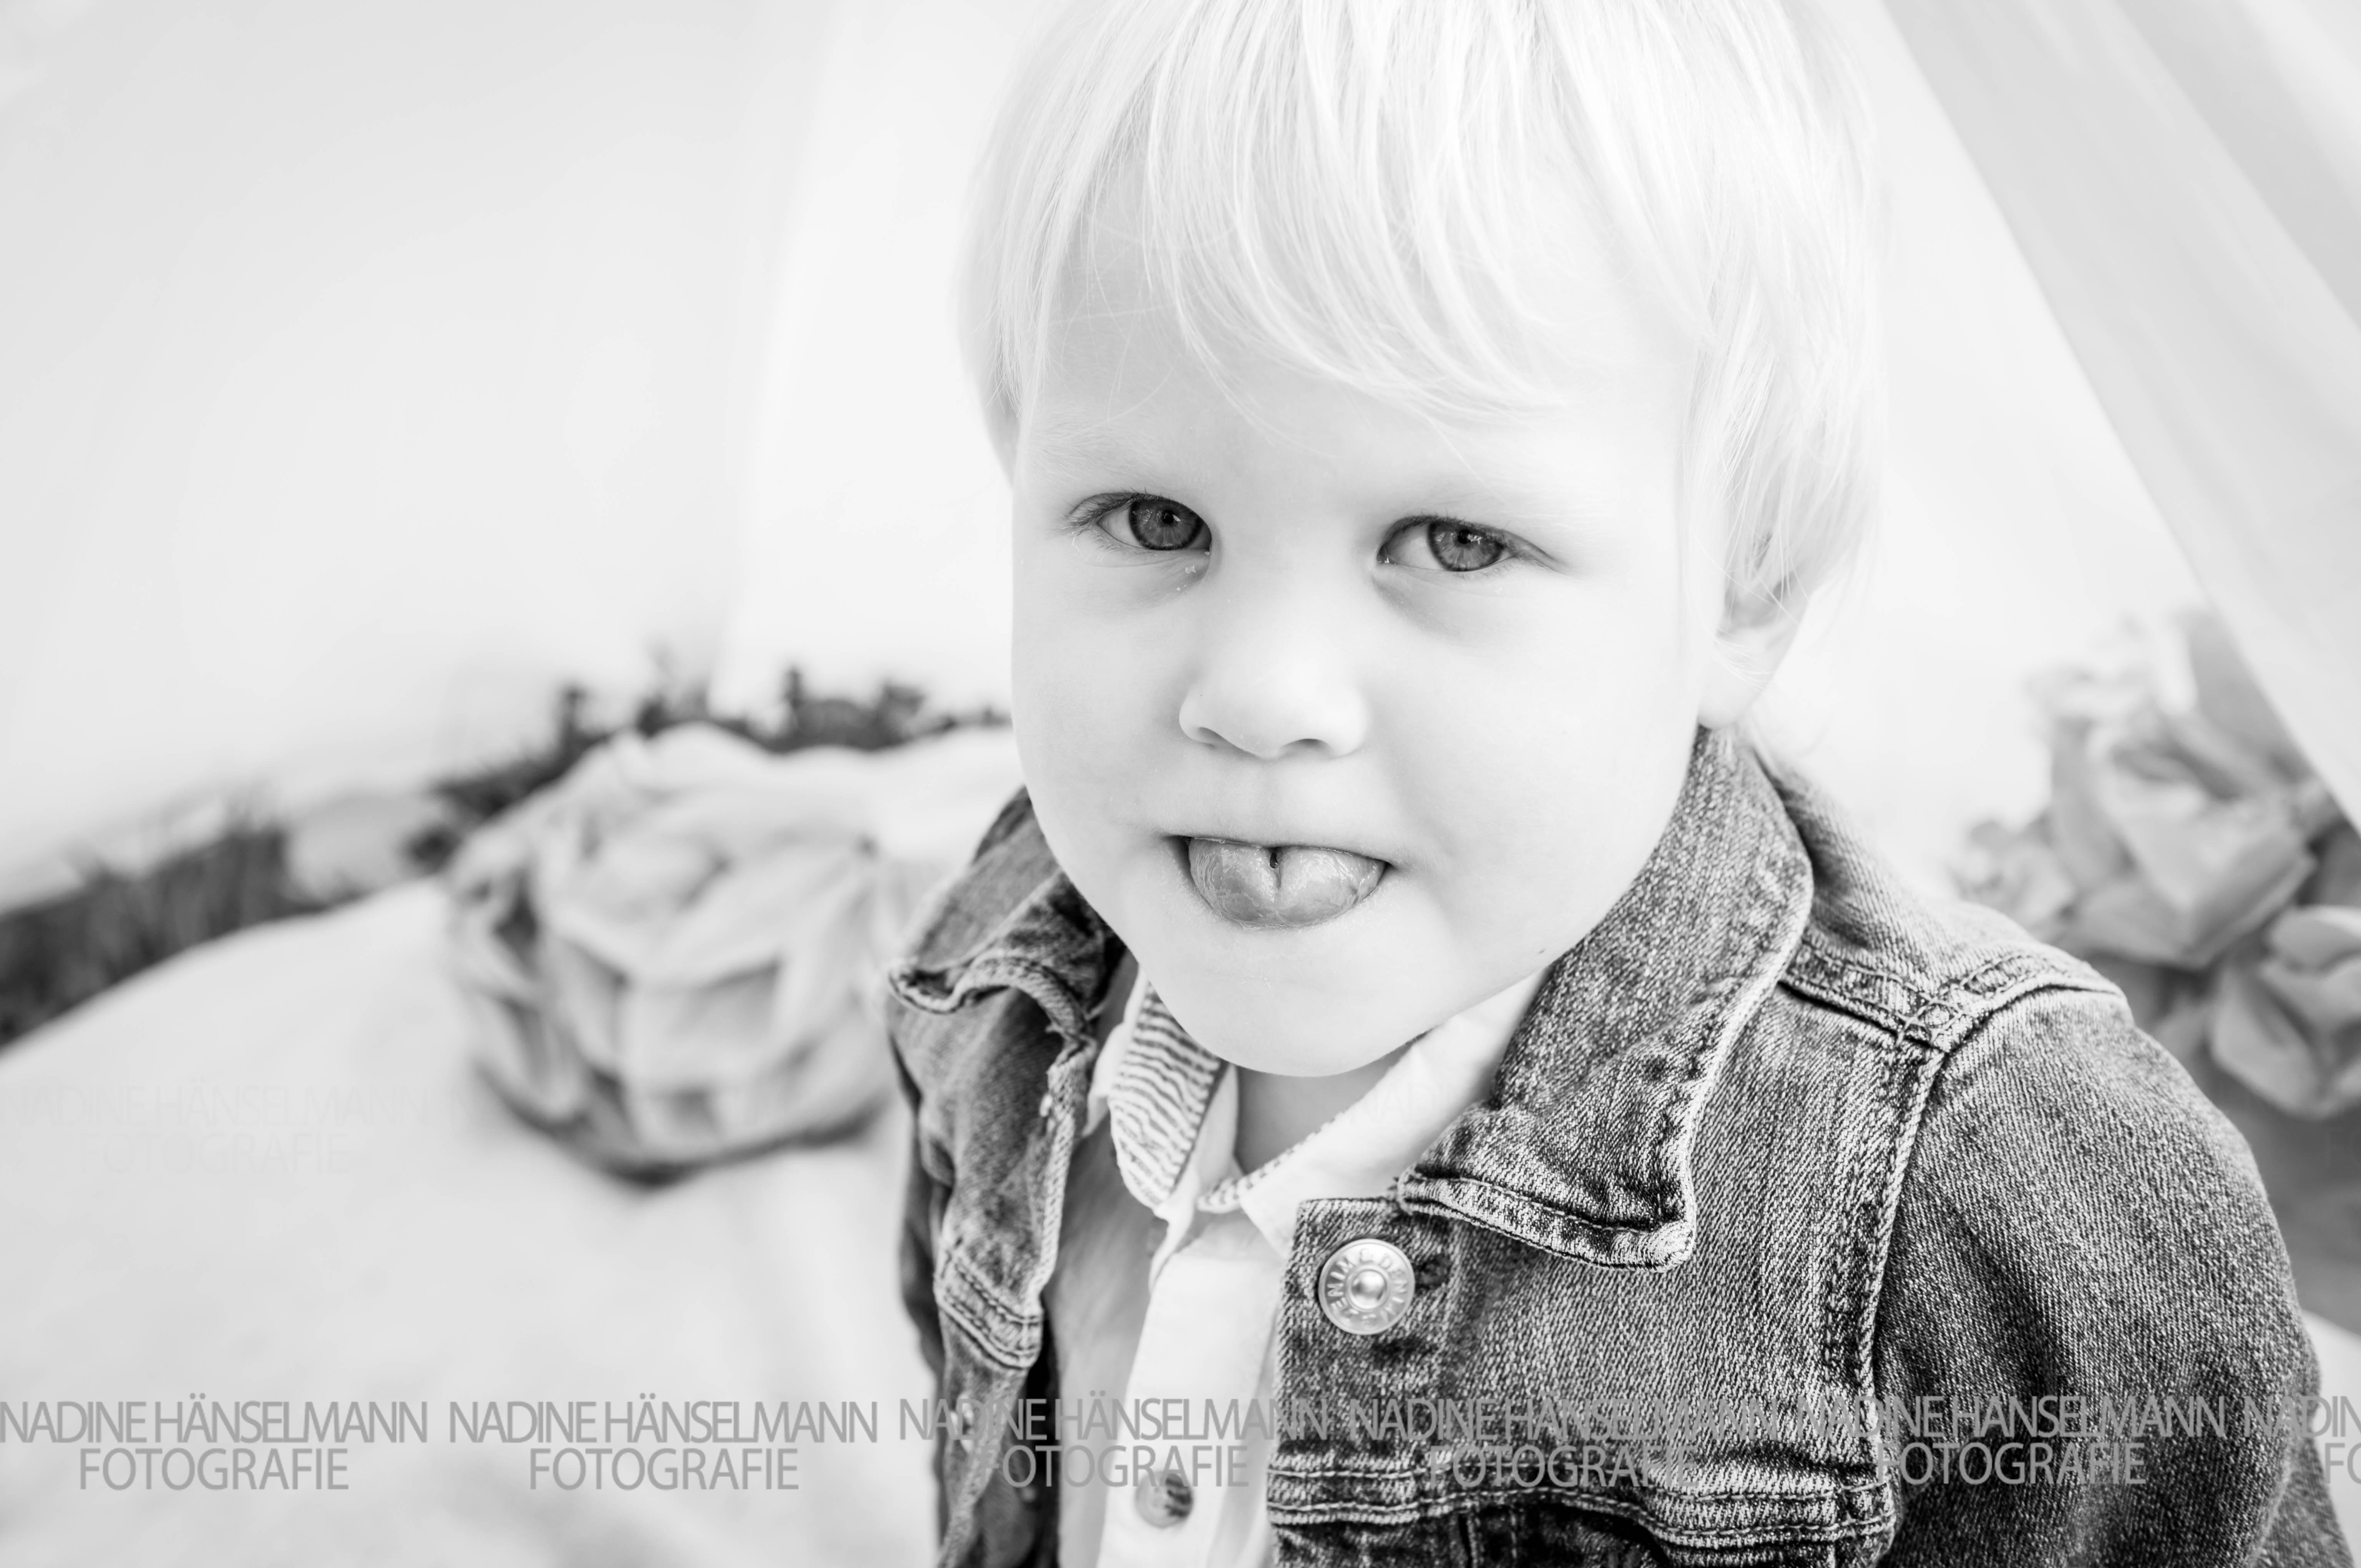 HaenselmannFotografie-3650